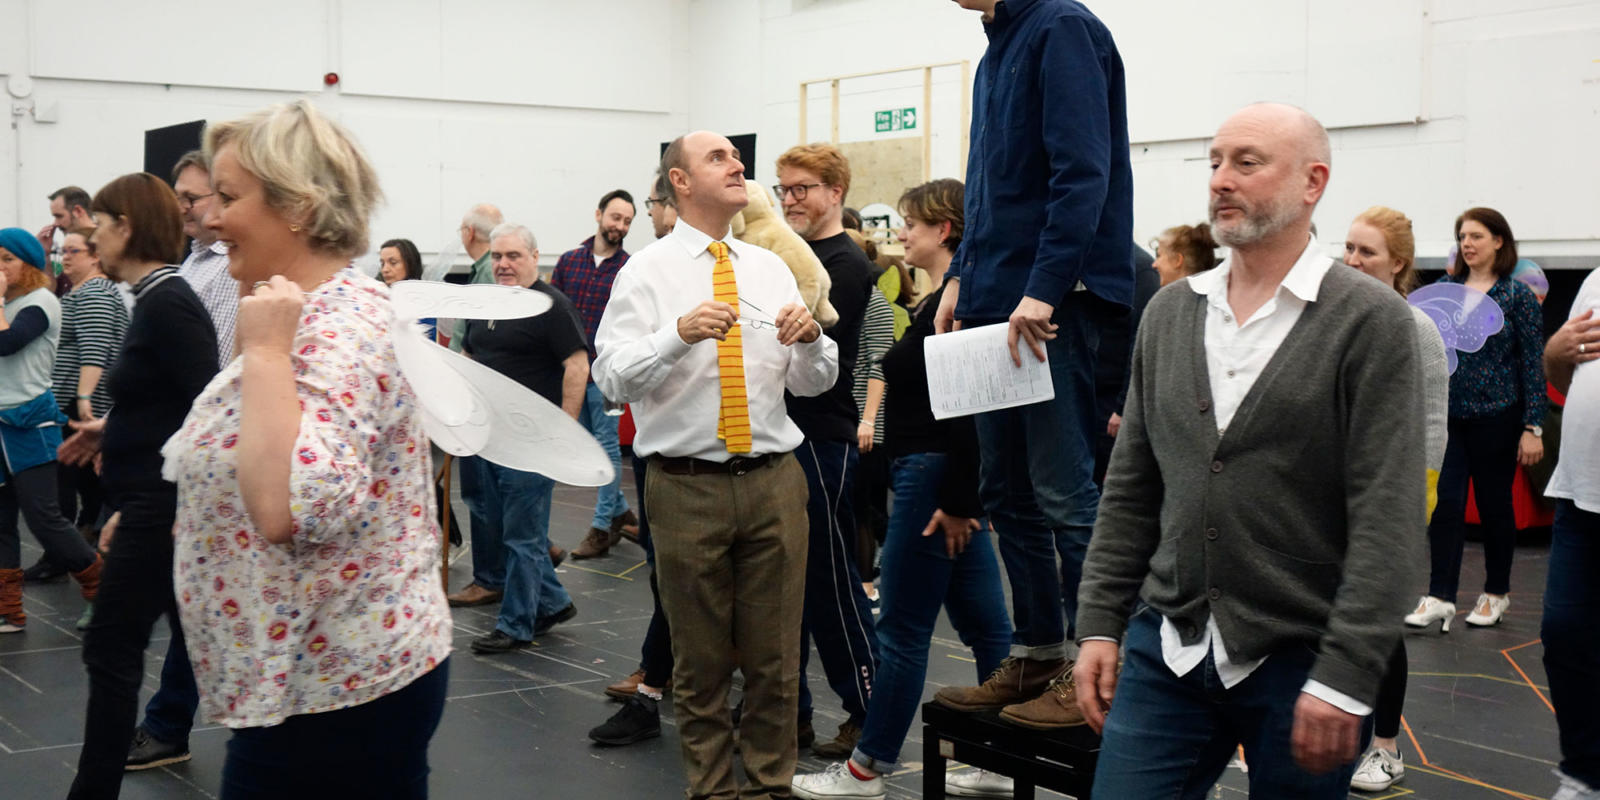 ENO Iolanthe: Director Cal McCrystal talking to Actor Richard Leeming